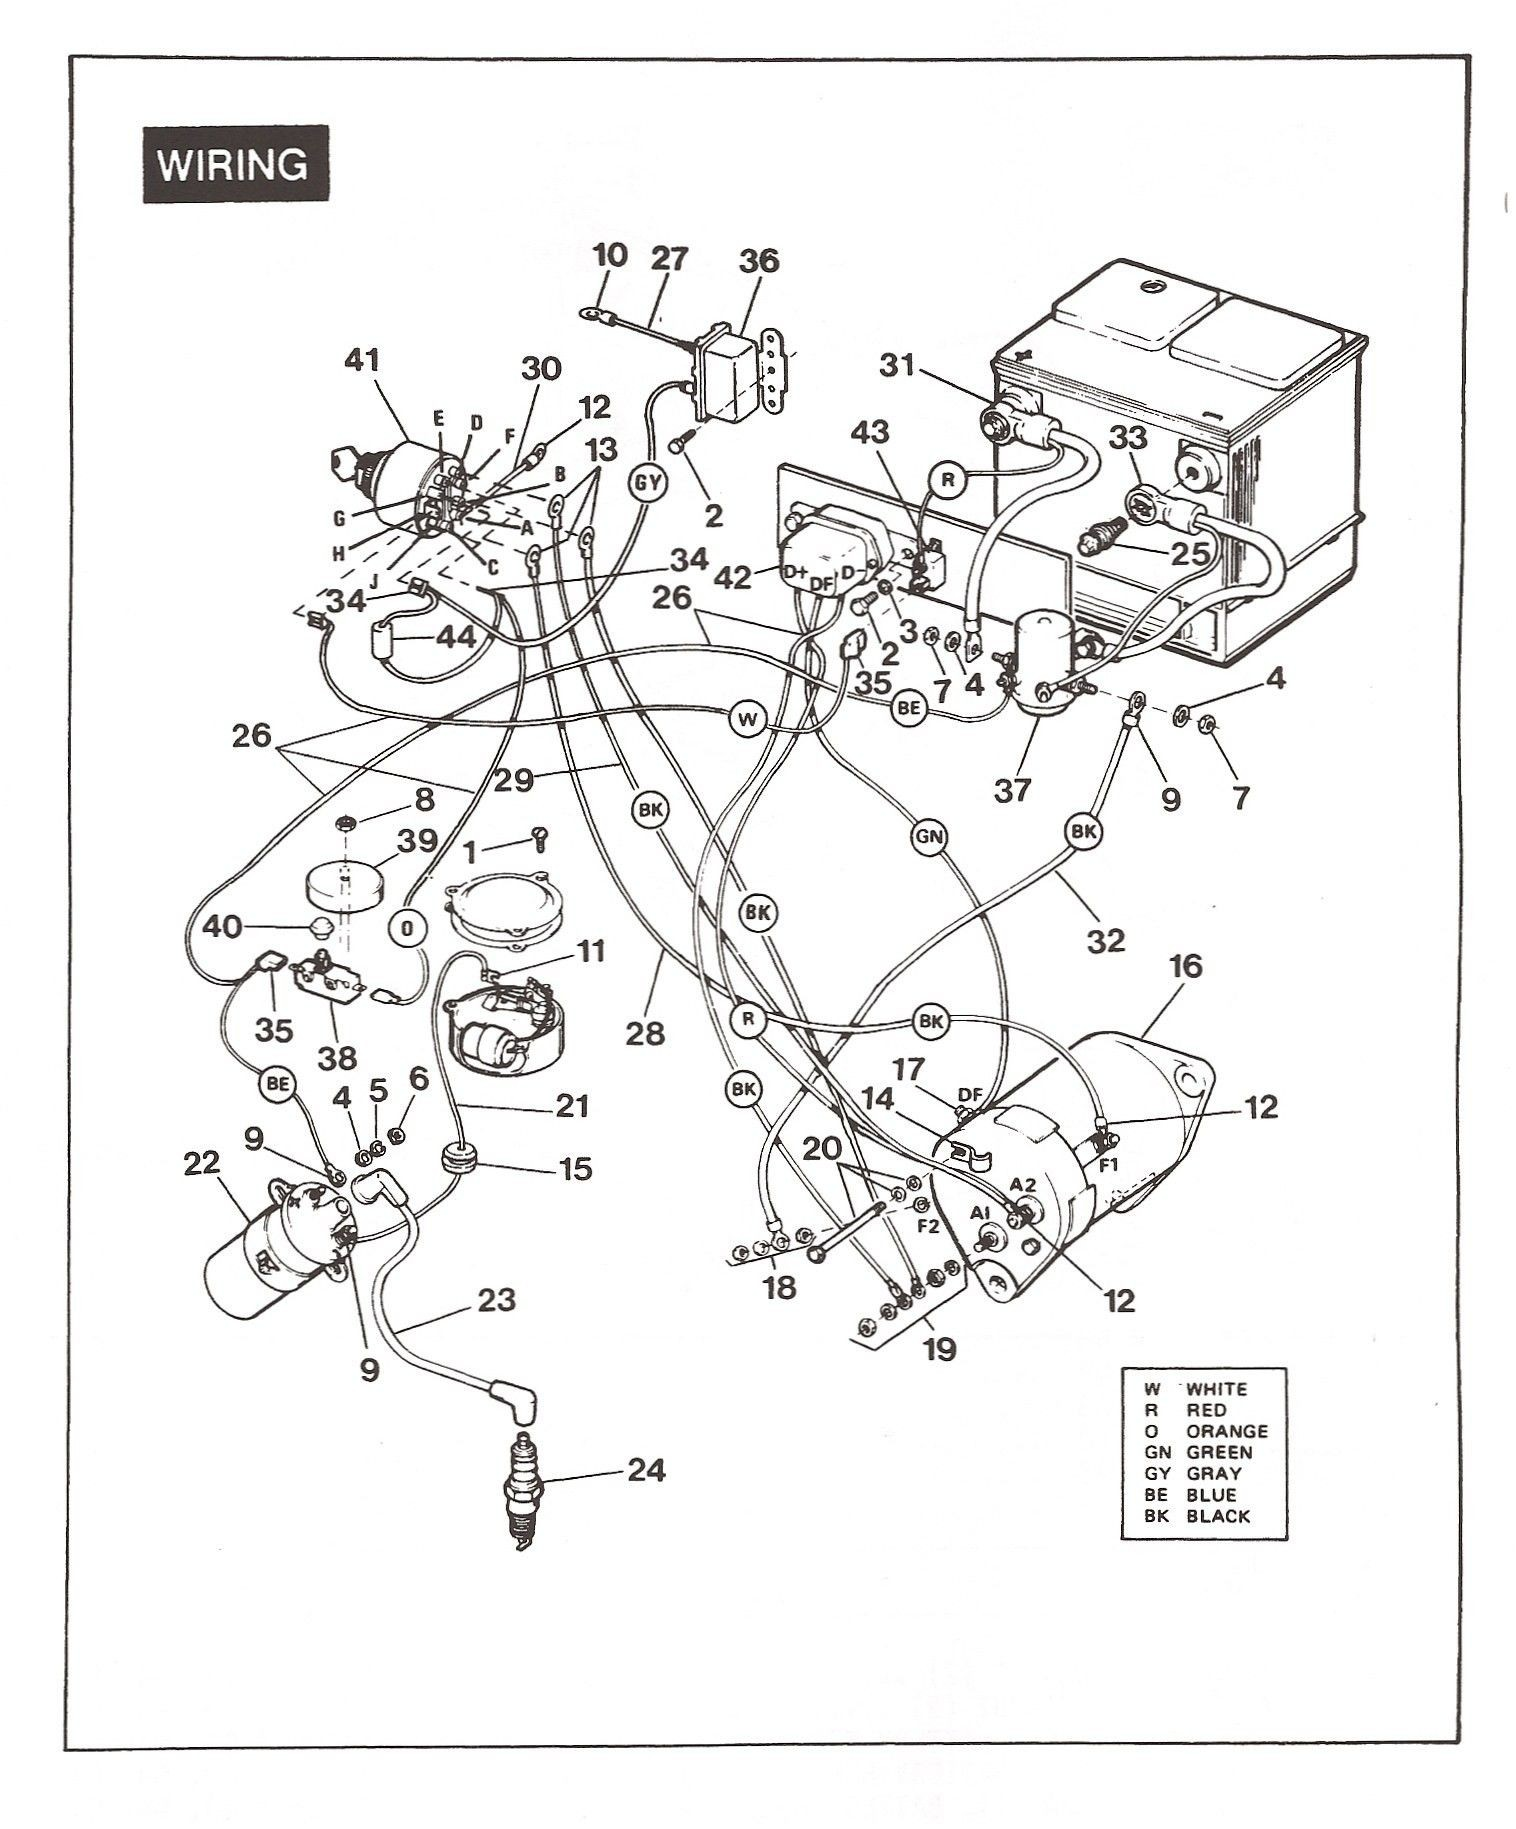 Diagram forward Reverse Switch 2007 Club Golf Cart Unique Wiring Diagram 2007 Club Car Precedent Of Diagram forward Reverse Switch 2007 Club Golf Cart